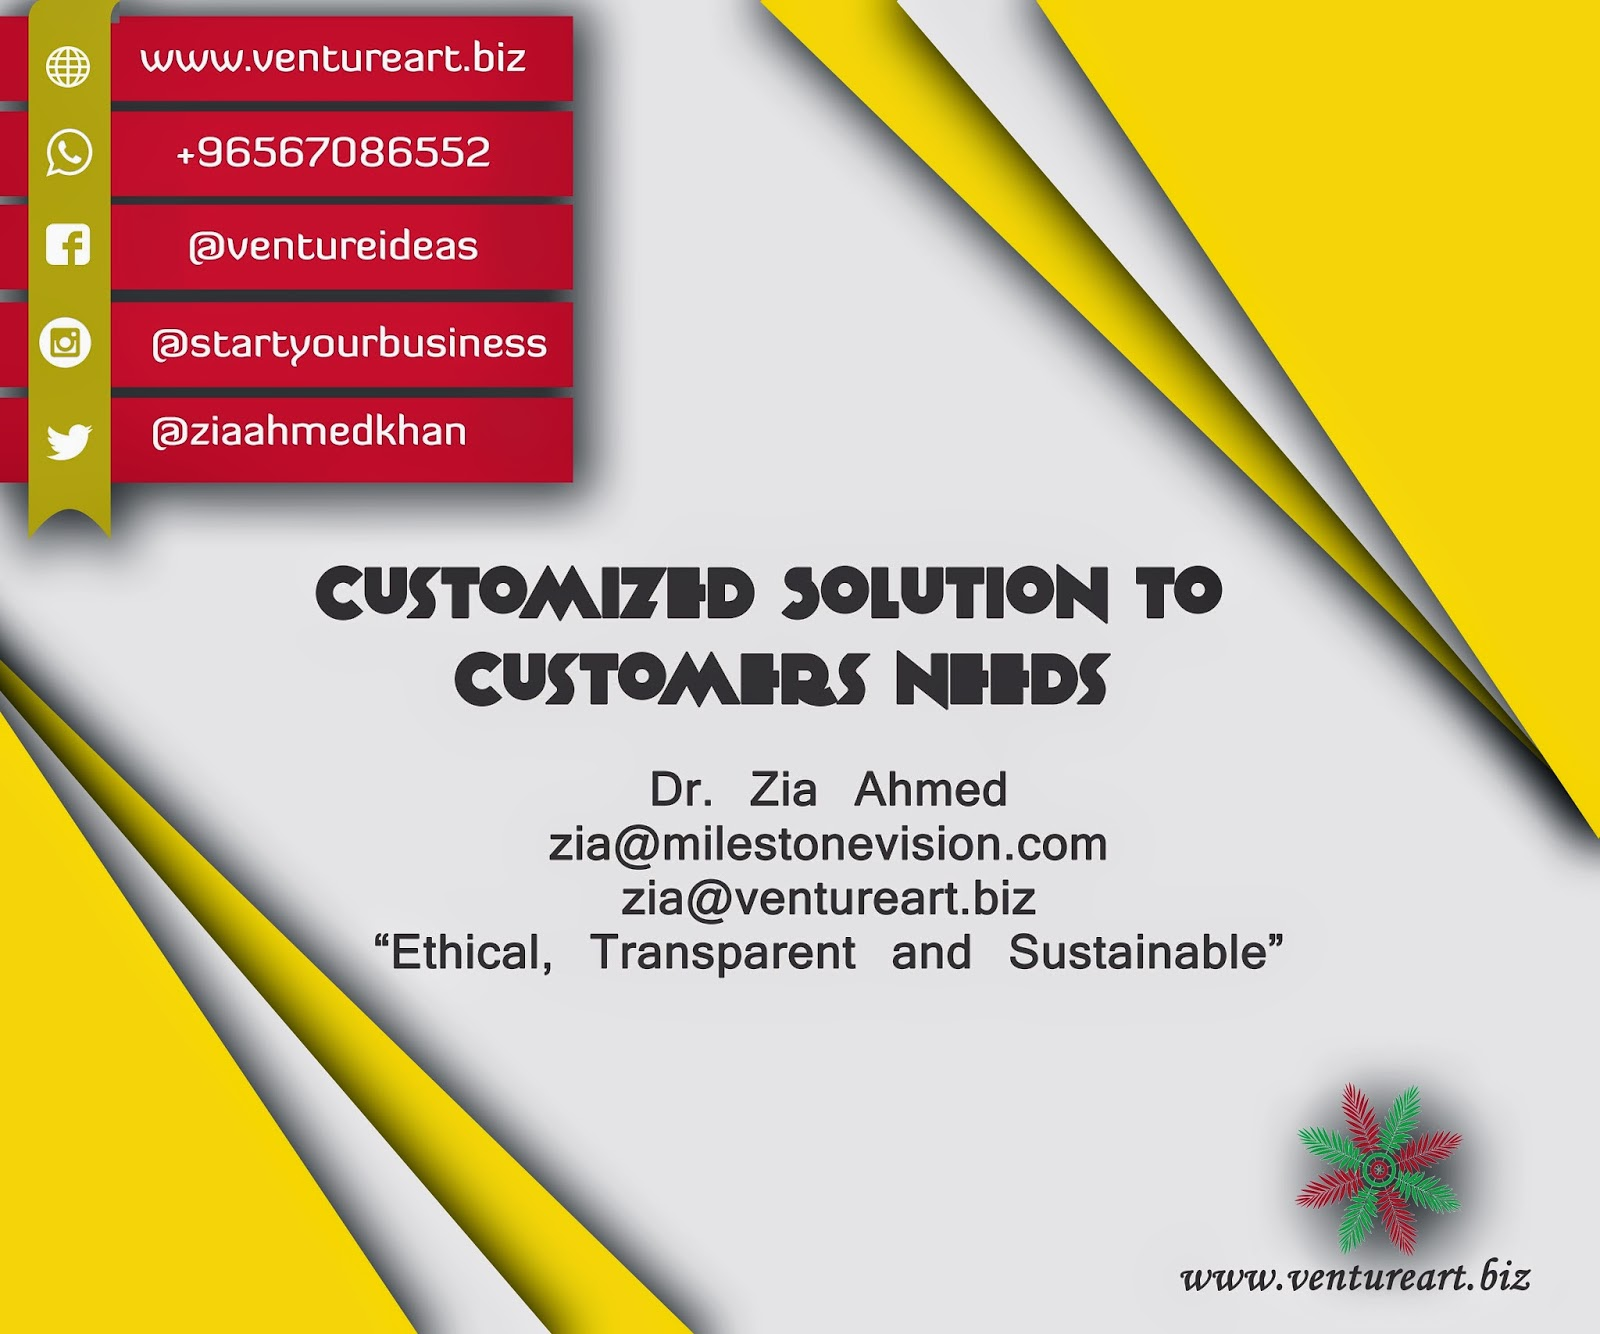 Venture Art Start-Up Solution